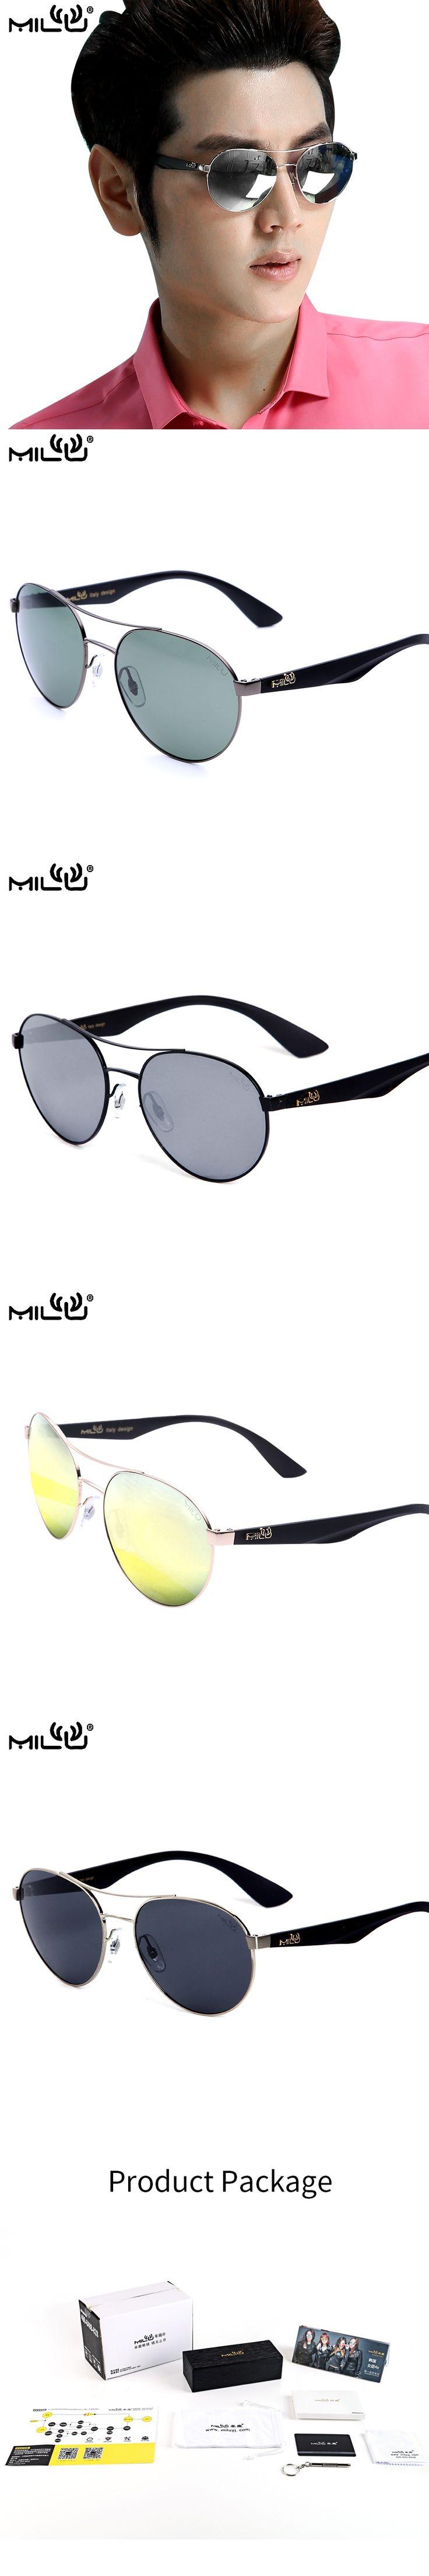 MILU Luxury Brand Logo Sunglasses For Men Polarized Outdoor Sport Fishing Aviator Sunglasses oculos de sol masculino ML3536